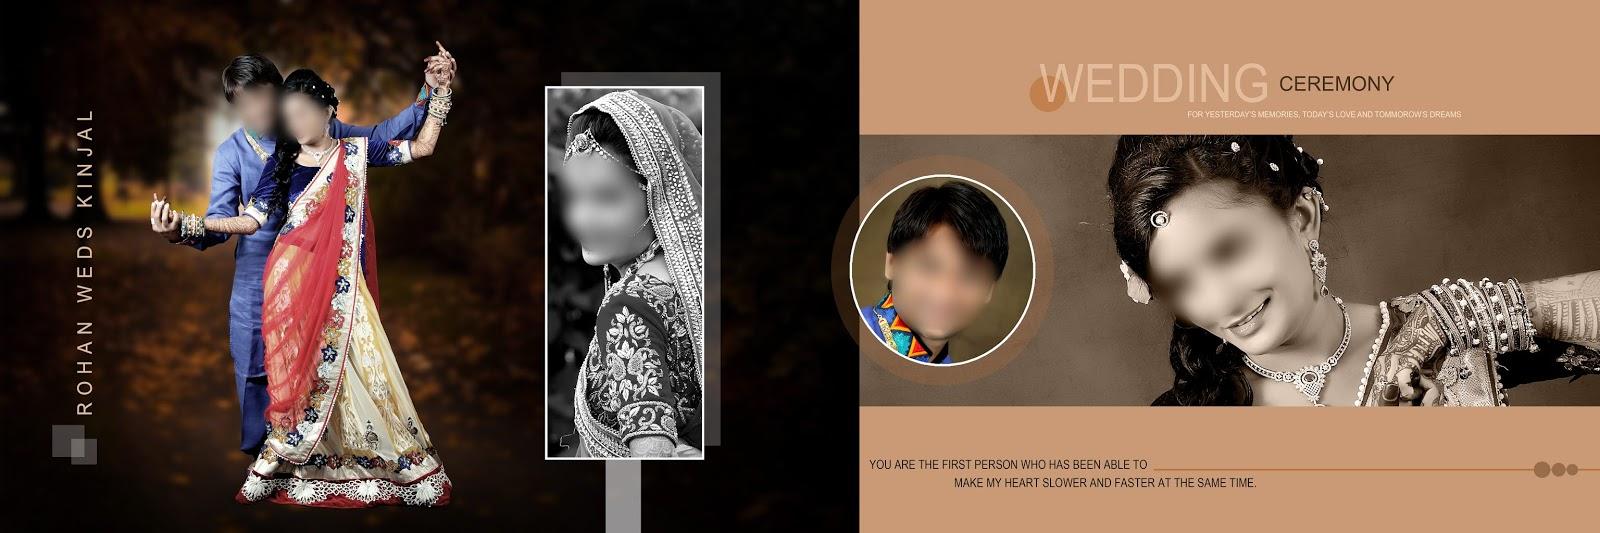 Wedding Background Hd 12x36 Psd Files Free Download Dm02